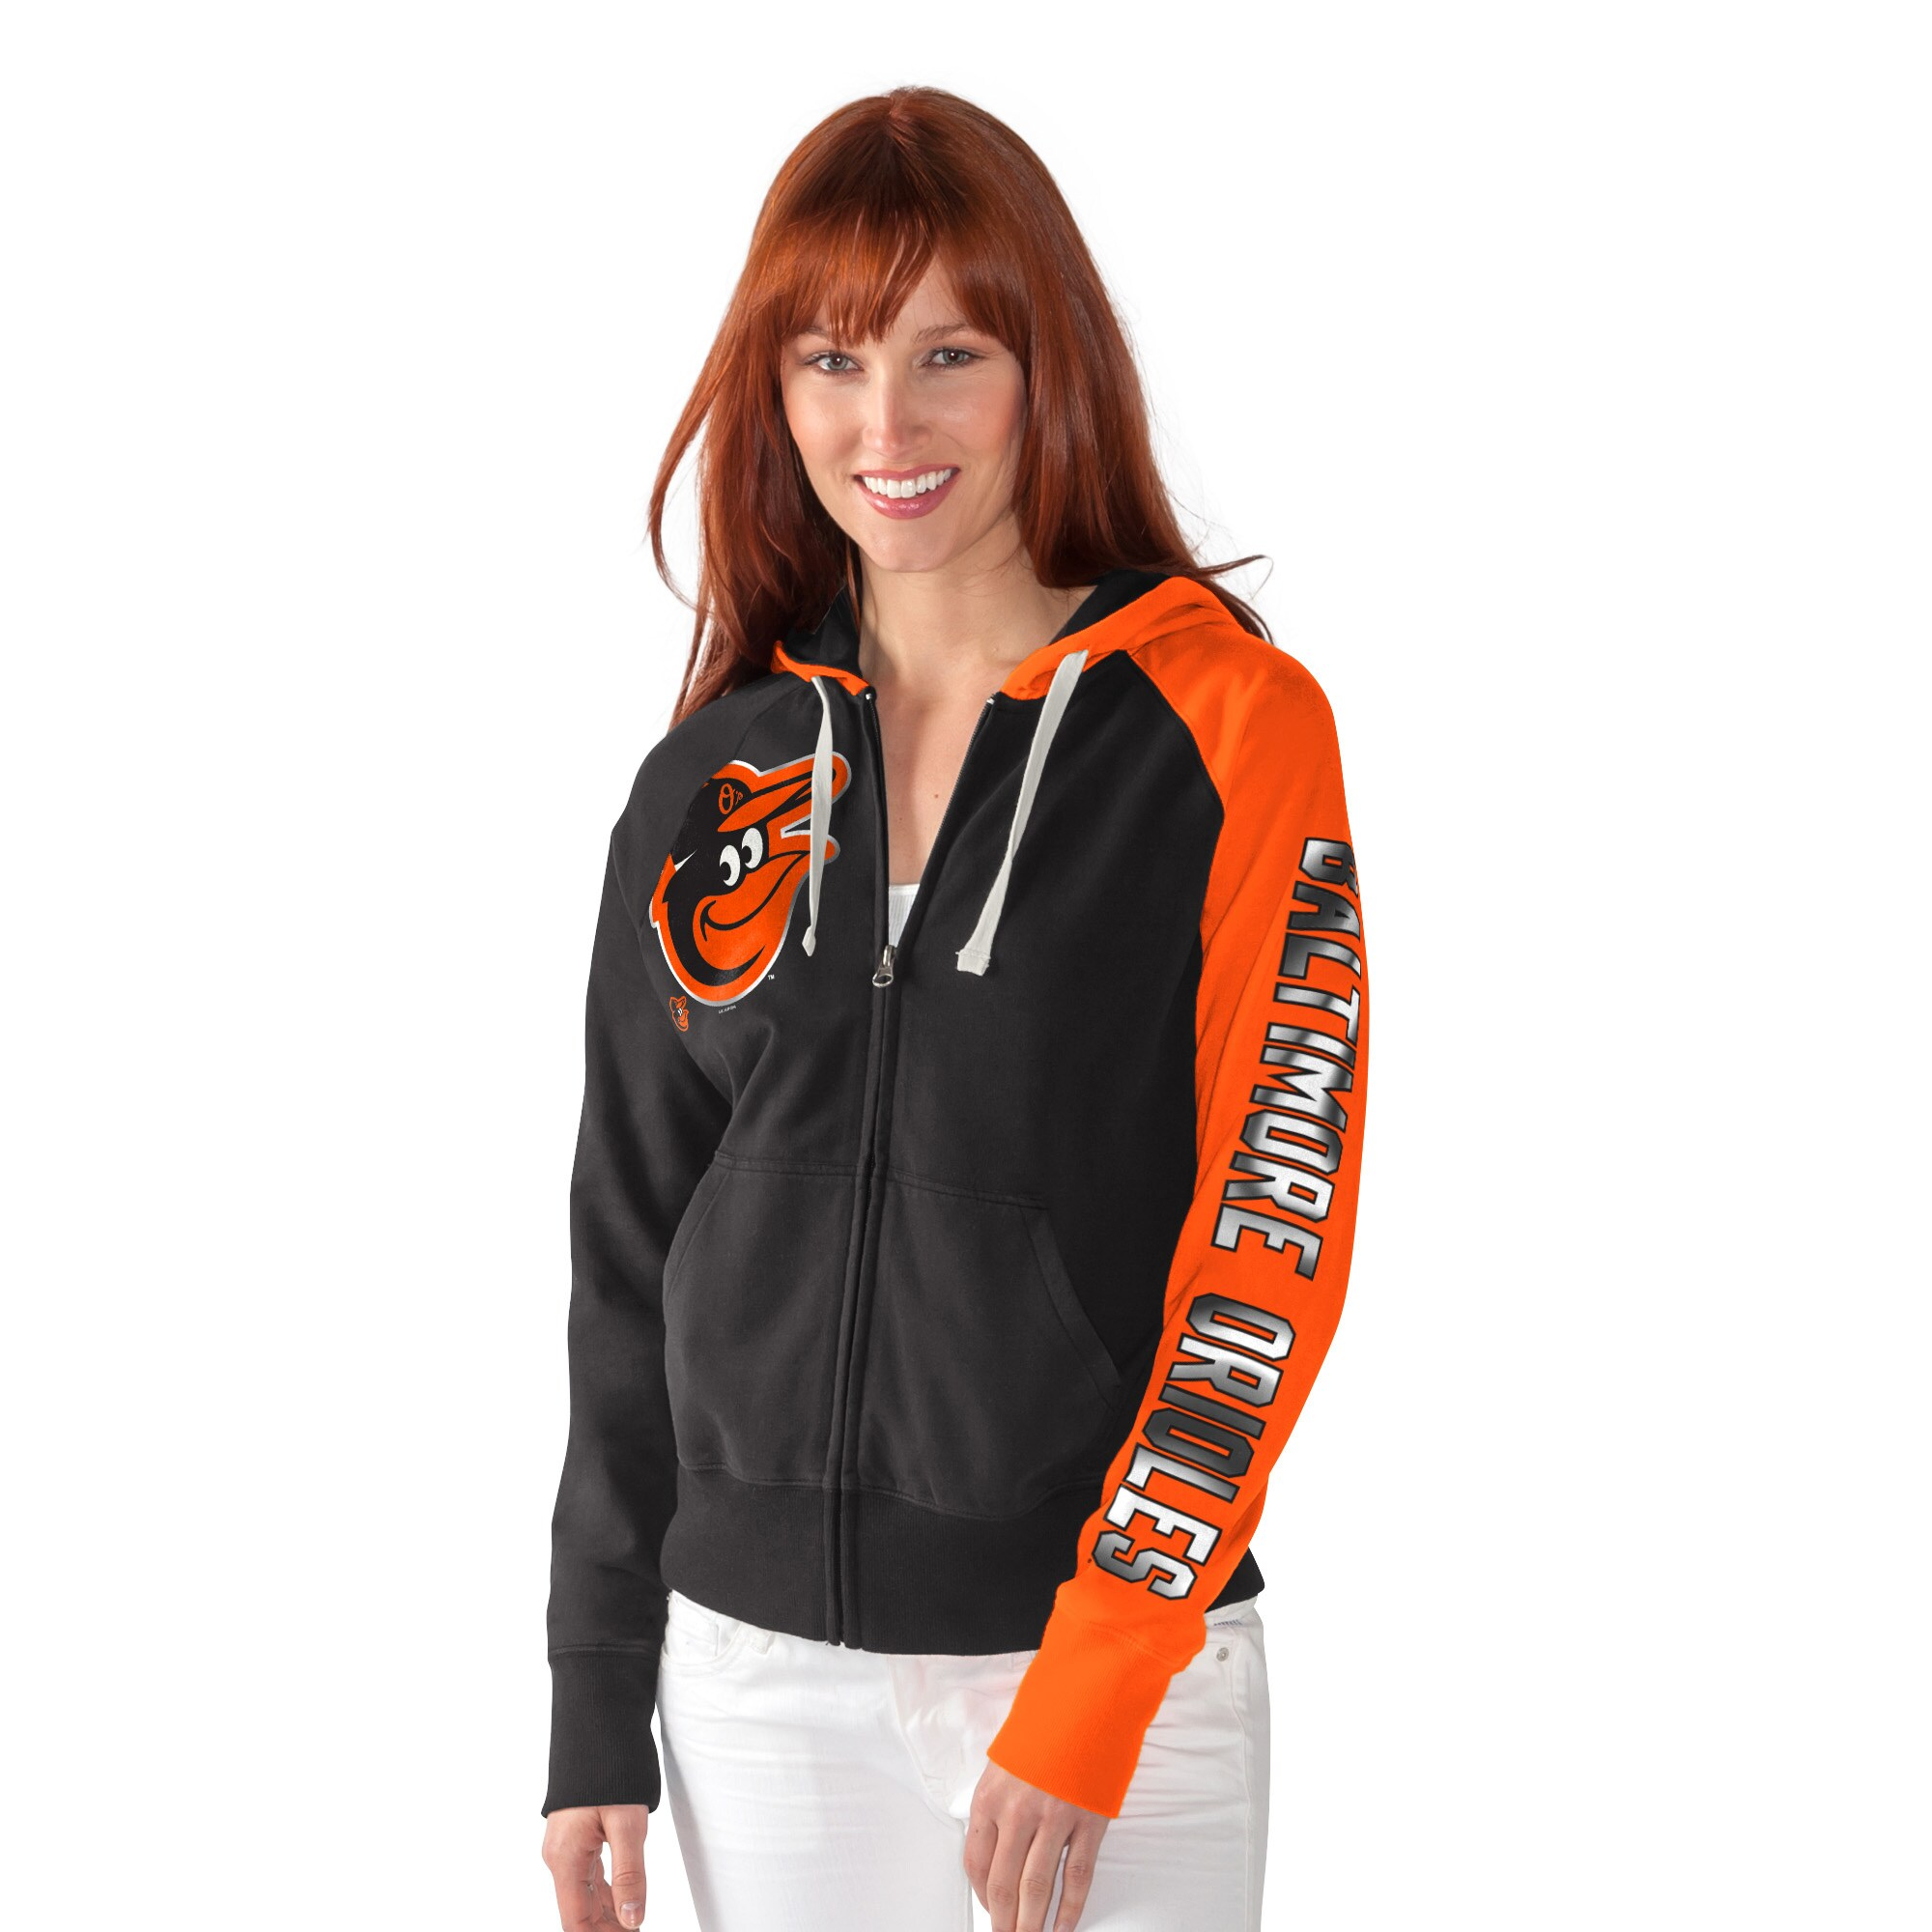 Baltimore Orioles G-III Sports by Carl Banks Women's South Paw Full-Zip Hoodie - Black